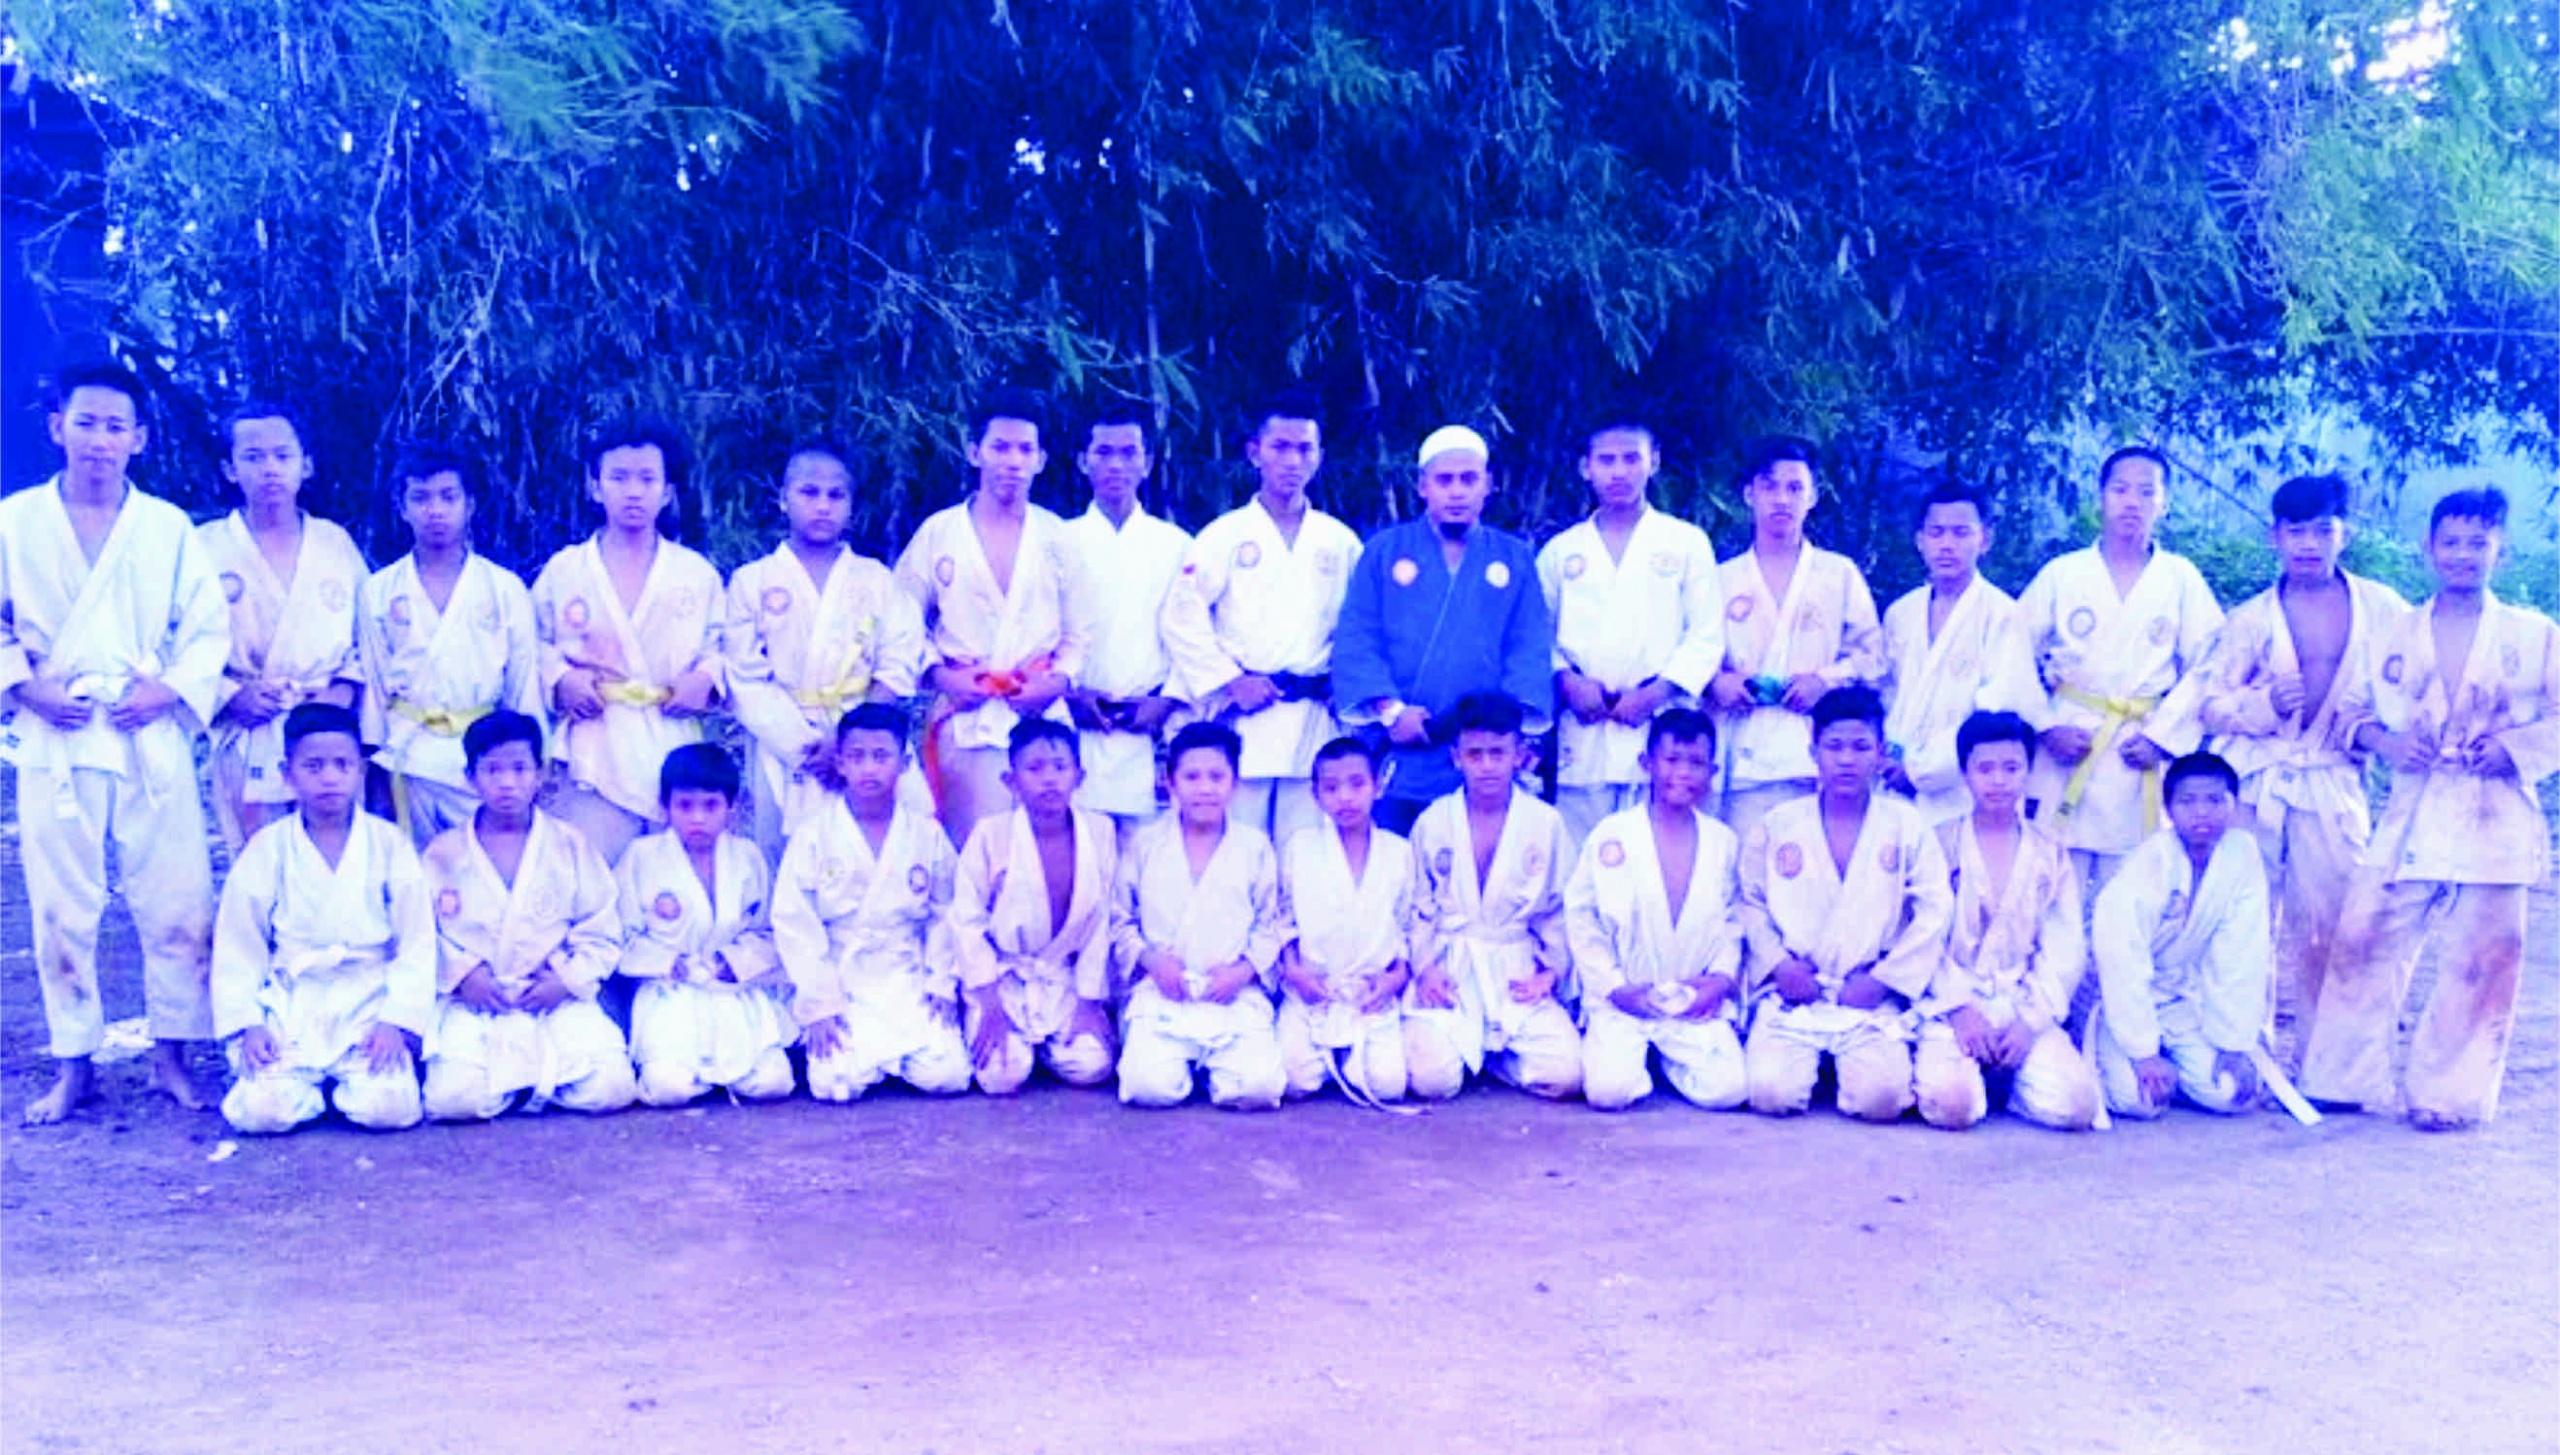 Jujitsu Yayasan Yatim Bait Alquran Mulia